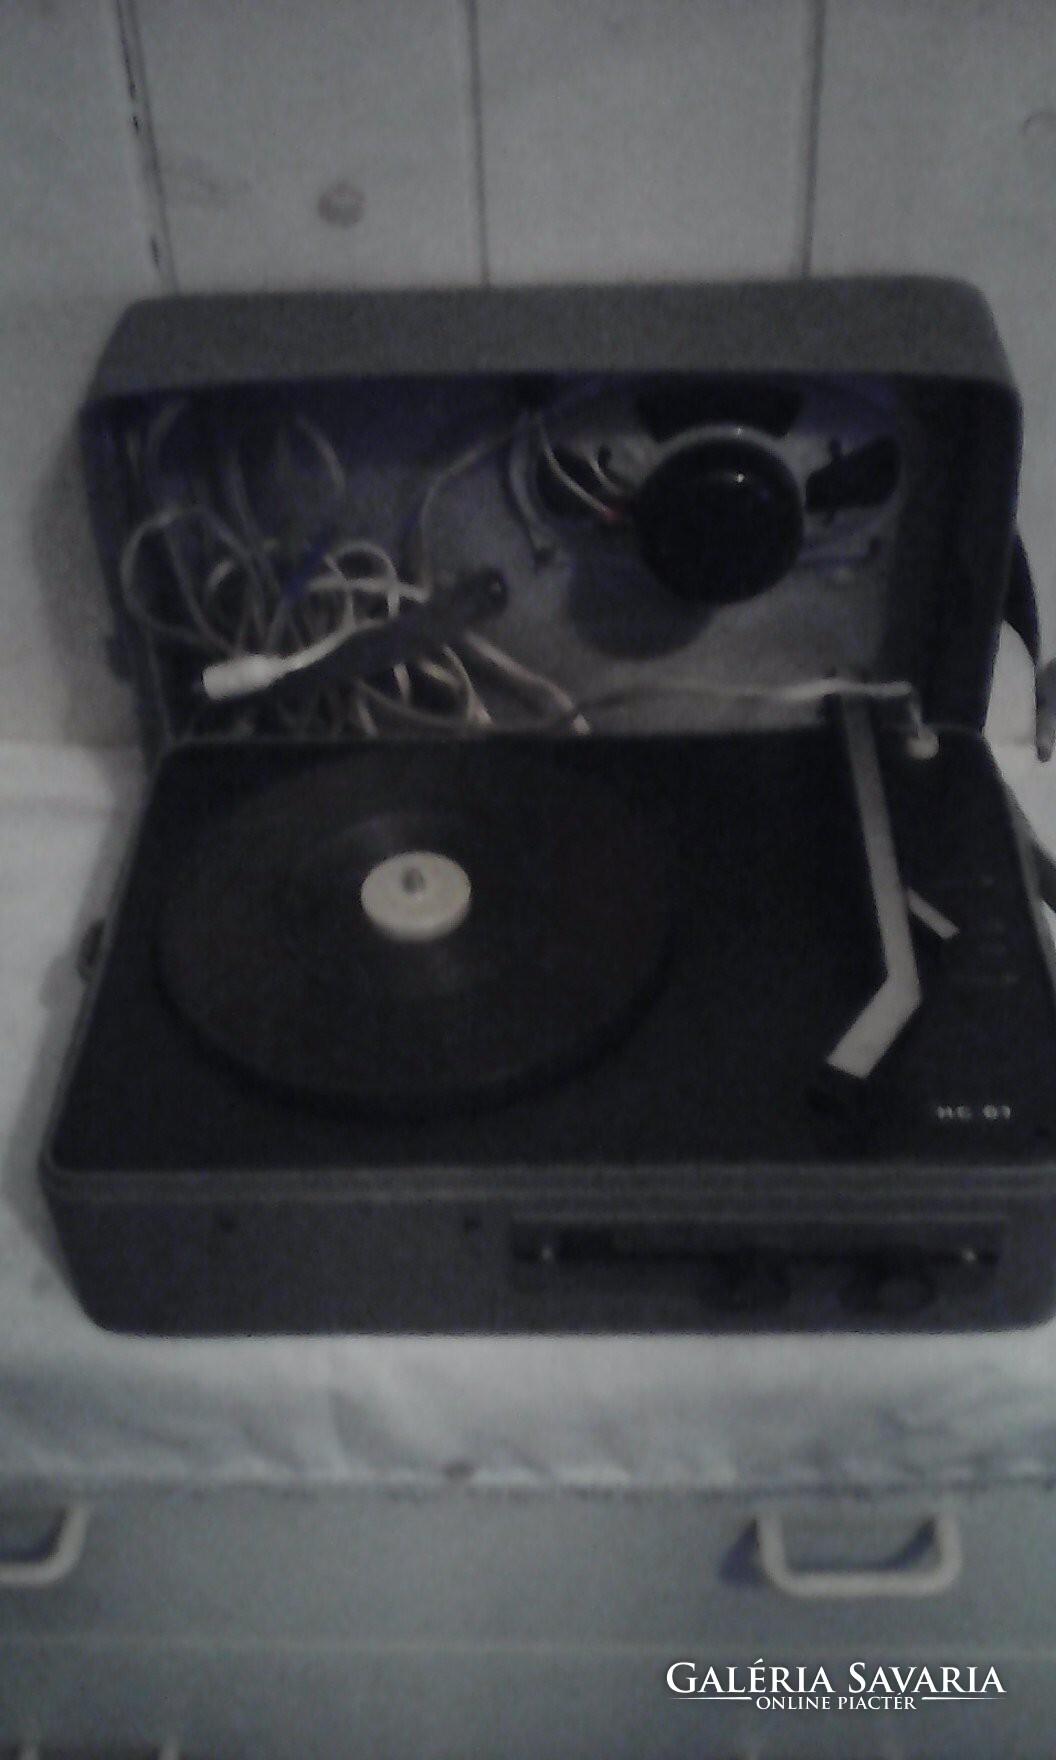 db6952b6de Record player, supraphon ge 070 - Music | Galeria Savaria online ...